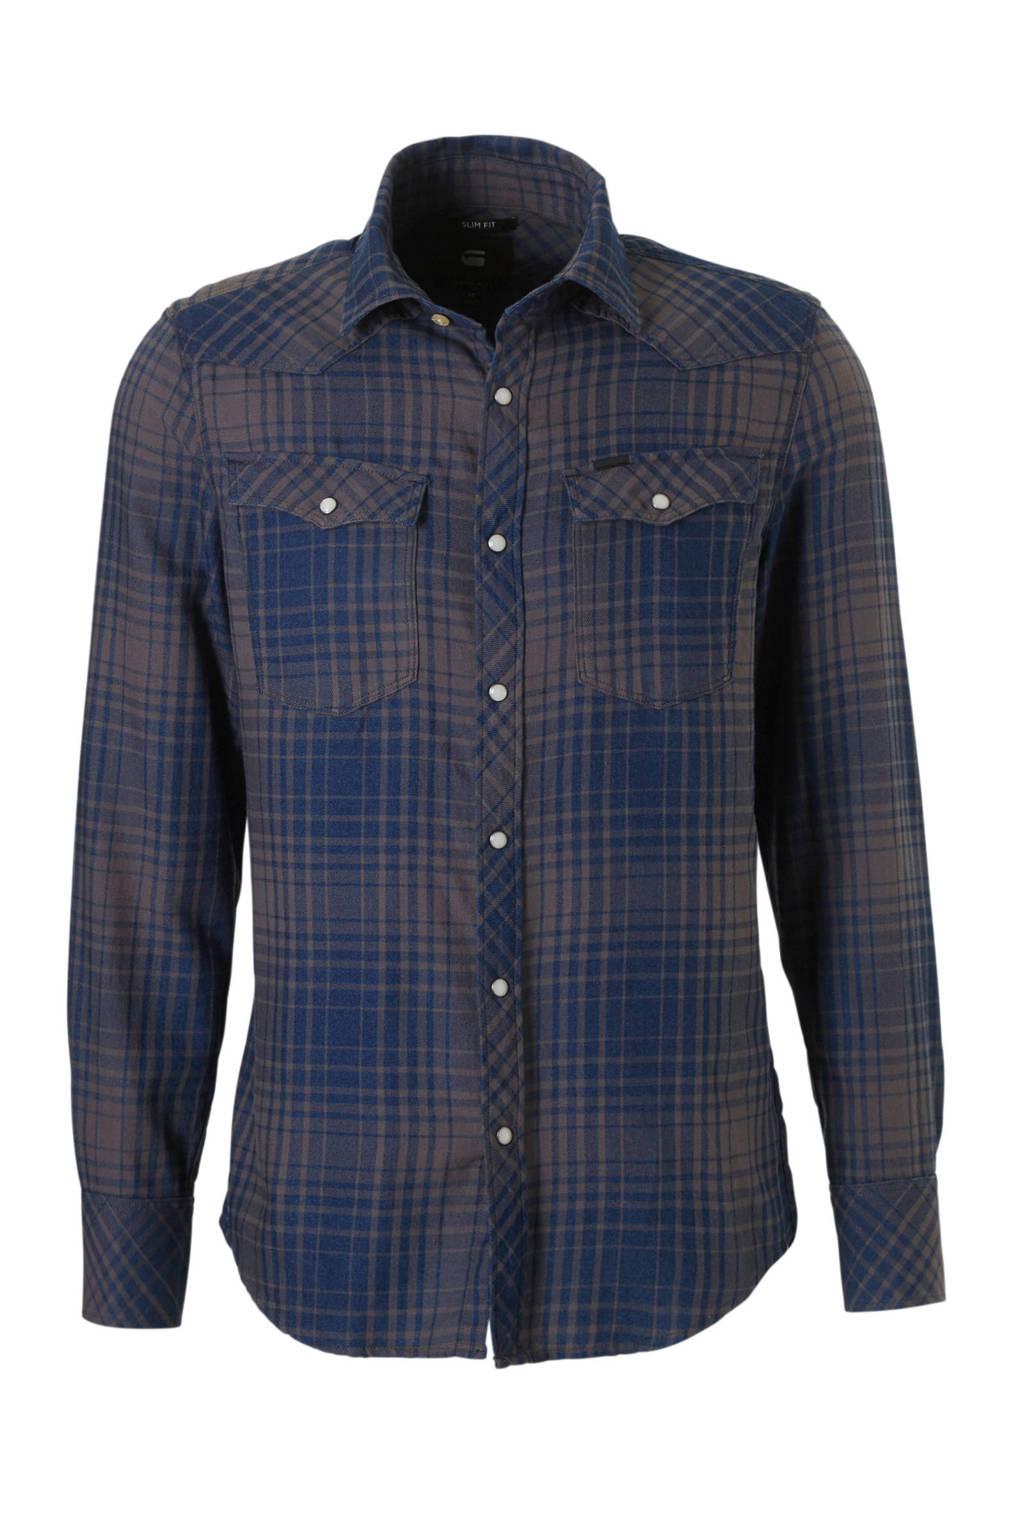 G-Star RAW slim fit overhemd, Blauw/grijs